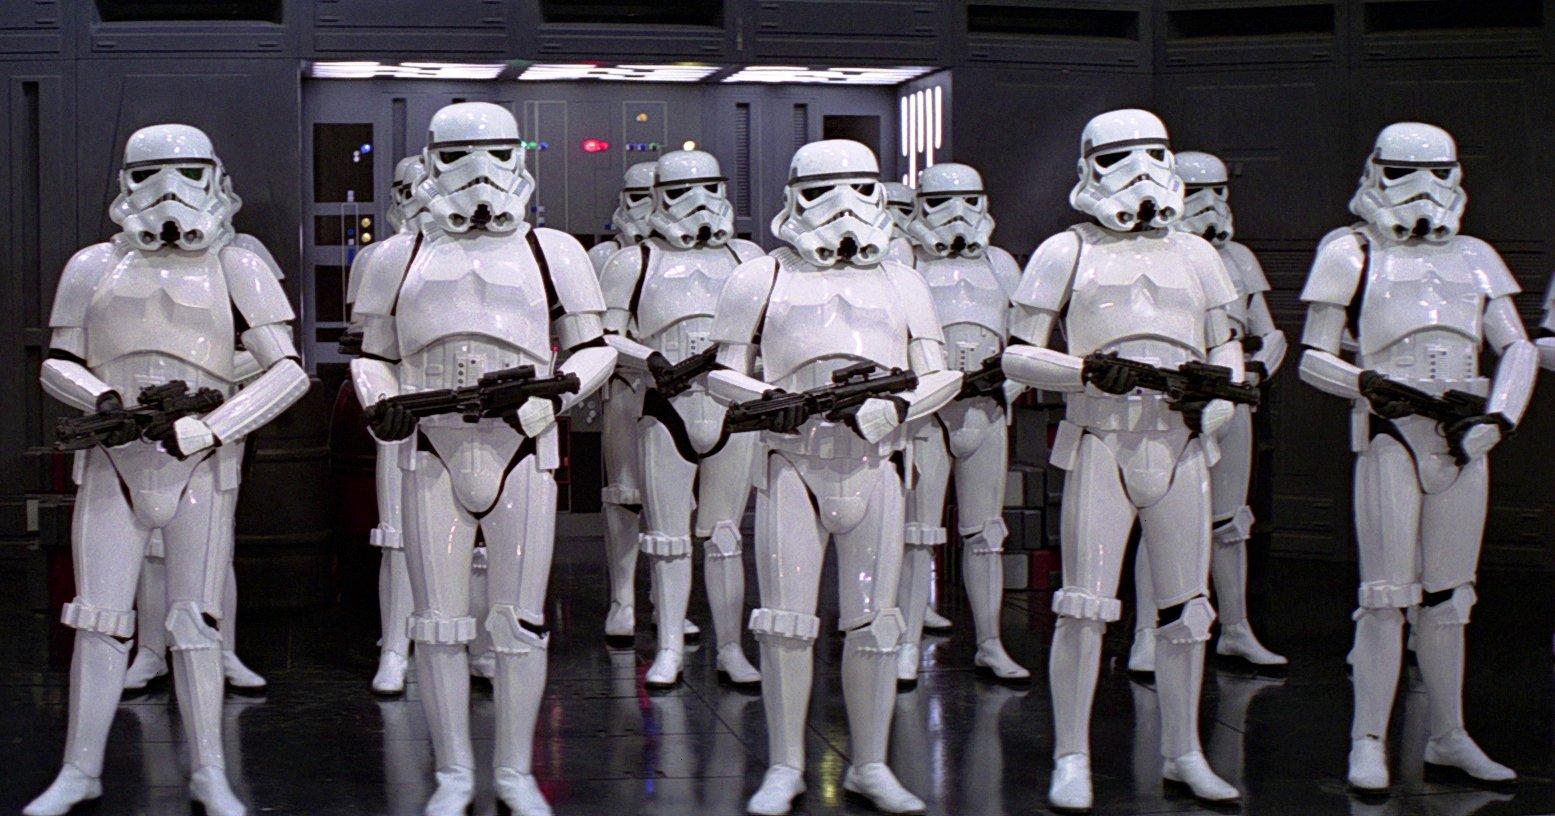 http://images2.wikia.nocookie.net/__cb20130414165041/ru.starwars/images/4/42/Imperial_Stormtroopers-2.jpg